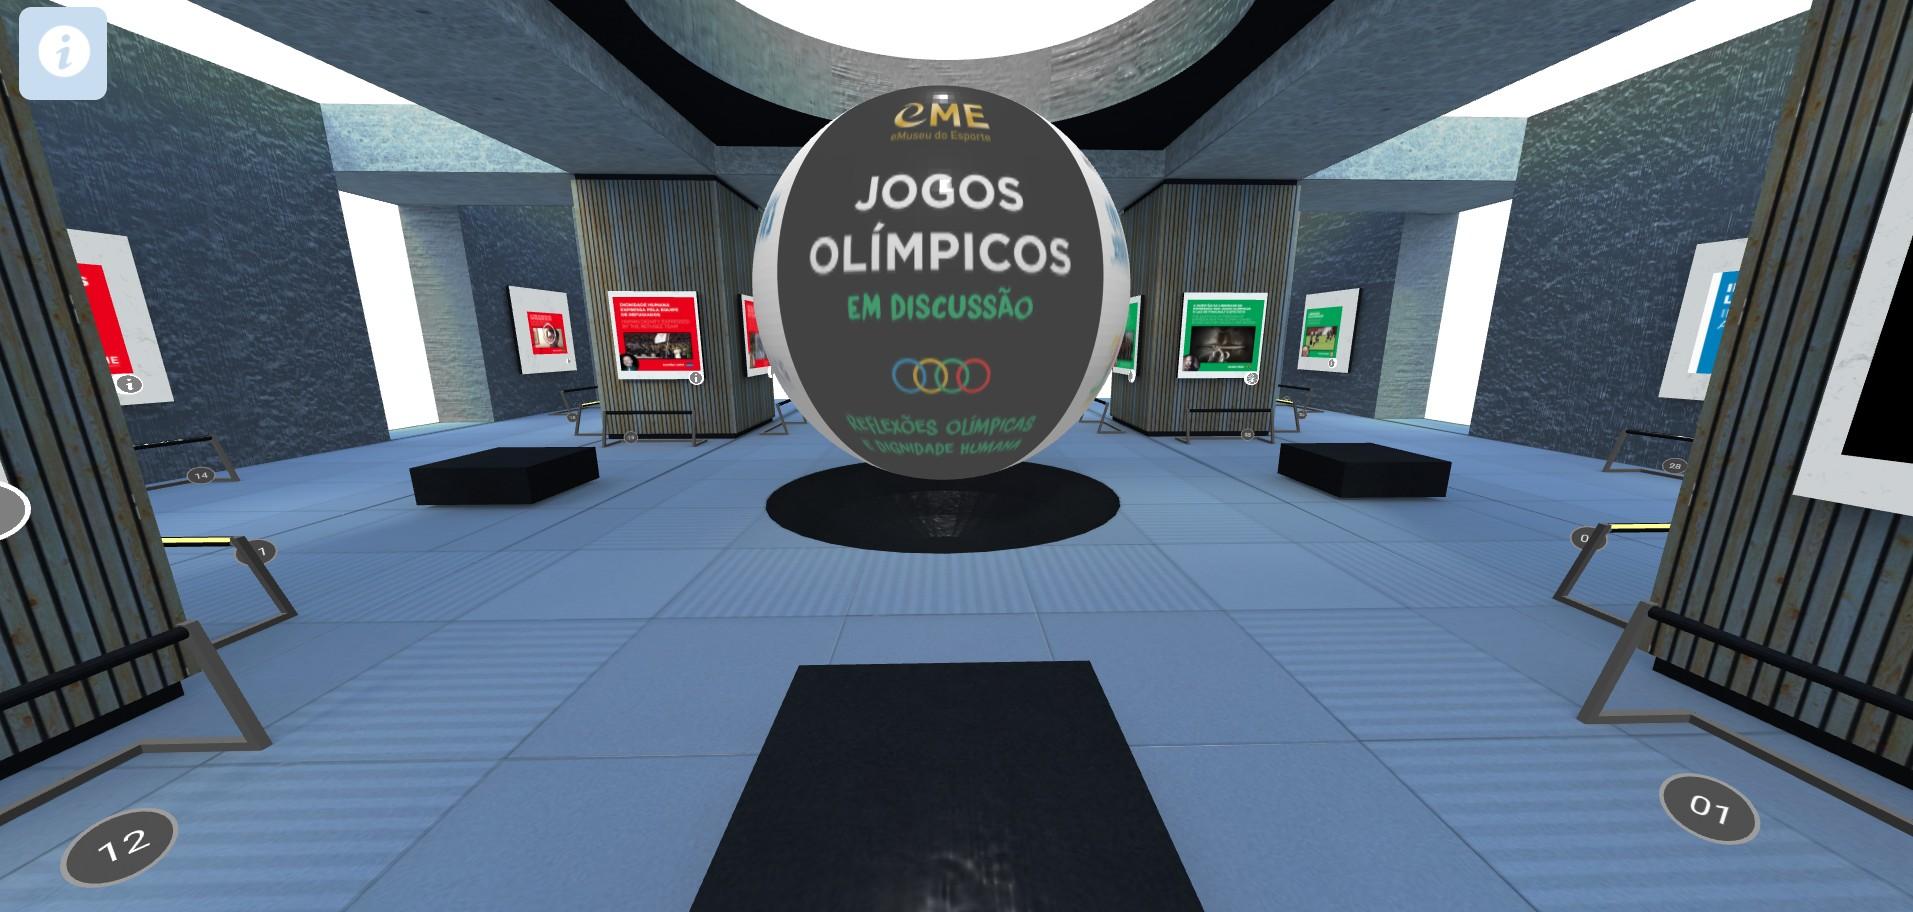 The virtual exhibition encourages debate on the social agenda at the Olympics (Photo: Reproduction / eMuseu do Esporte)